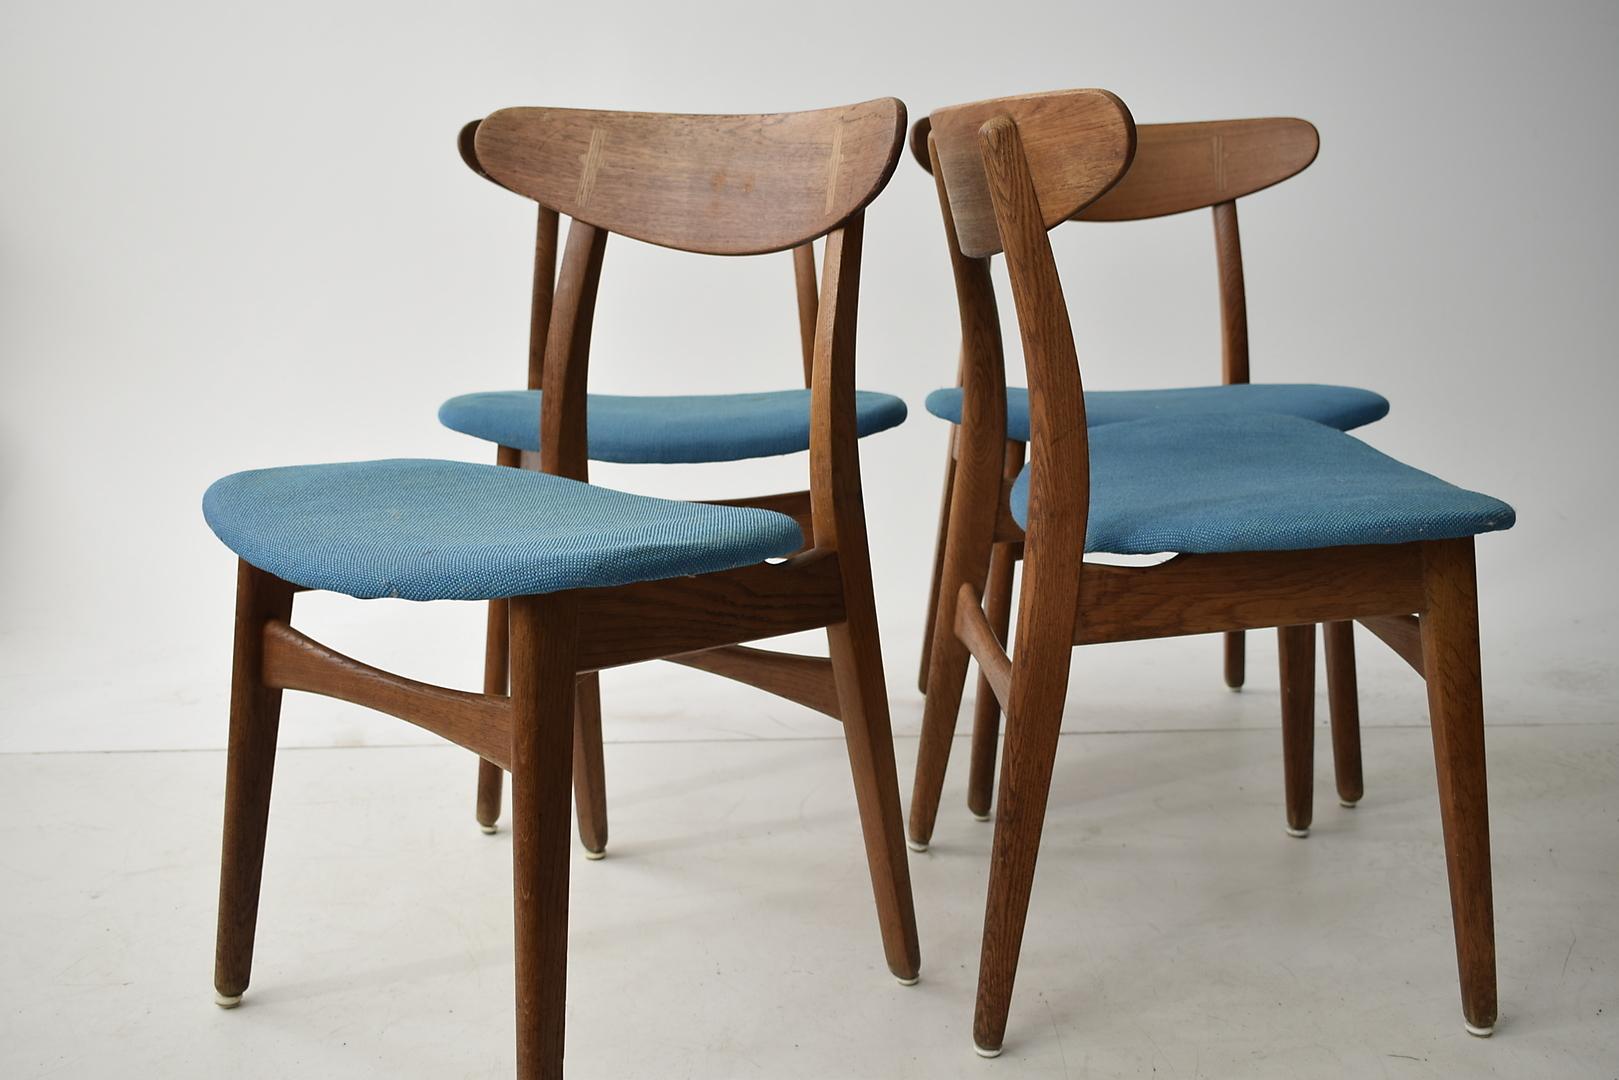 salón muebles da Vinci